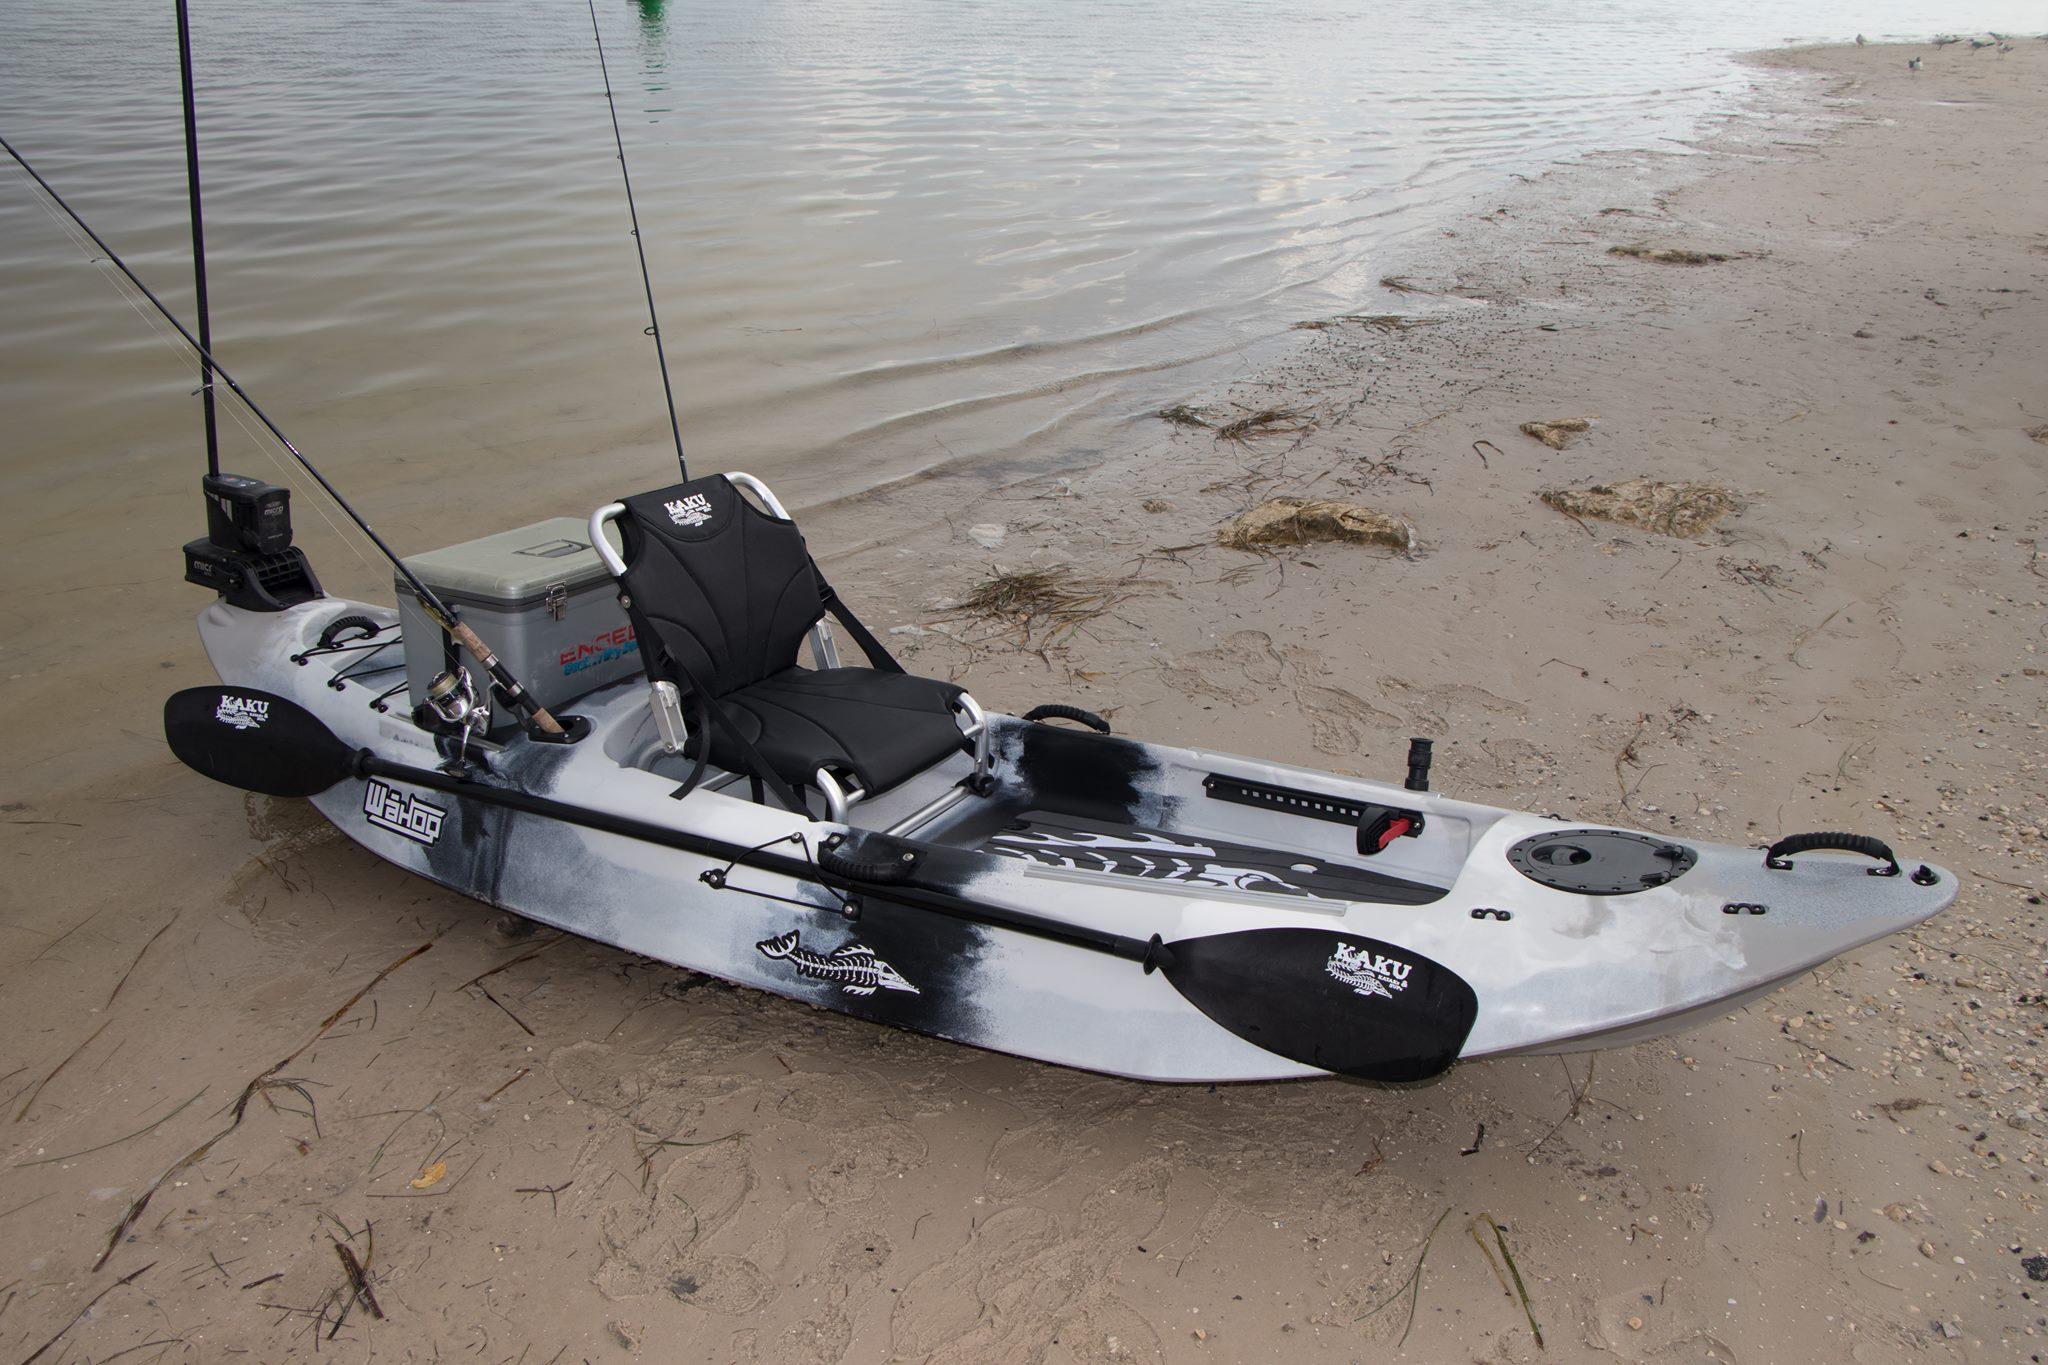 Kayaks: Wahoo 10.5 by Kaku Kayak - Image 2723